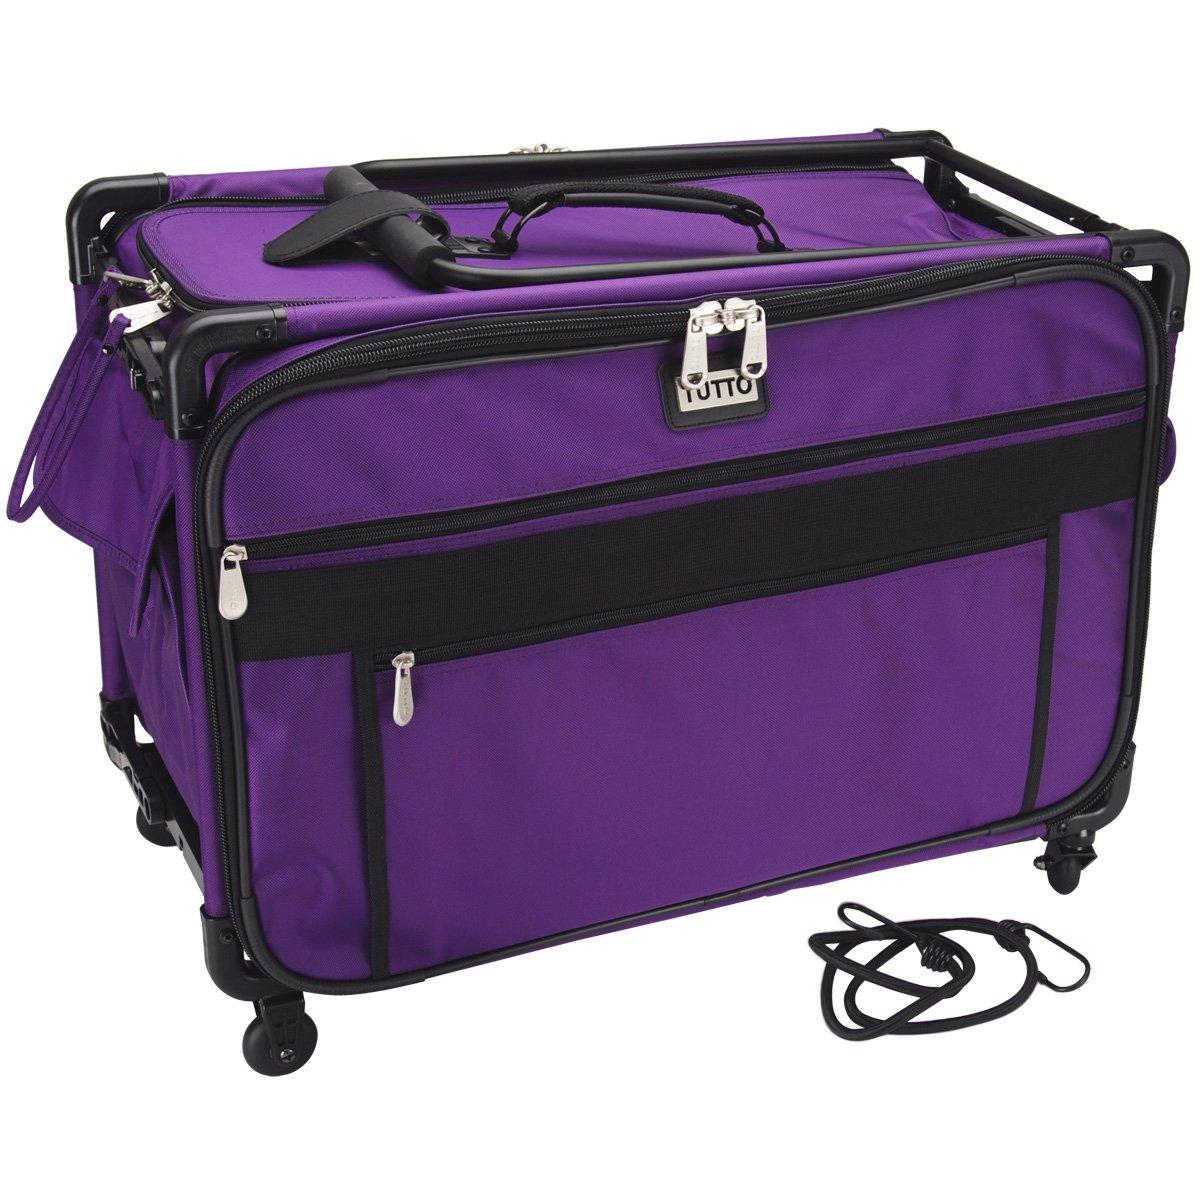 Mascot Metropolitan 9224PMA-1X 9224PMA-1X Tutto Machine Case On Wheels, X-Large/24, Purple Bohin